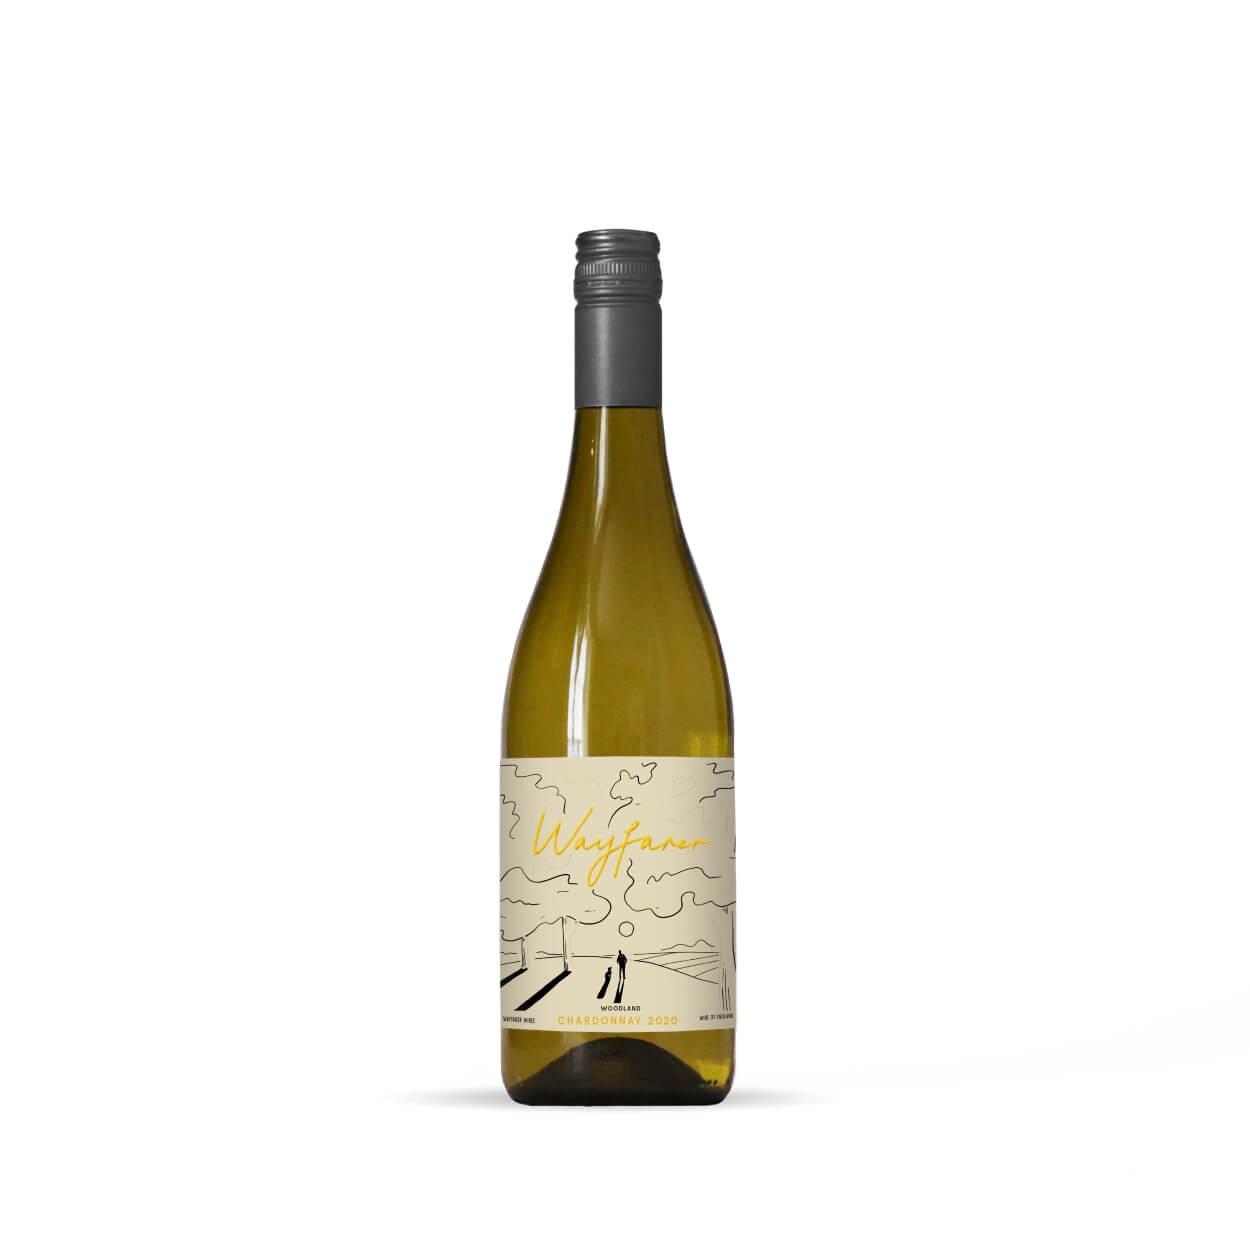 Wayfarer Wines Woodlands Chardonnay 2020 English White Wine